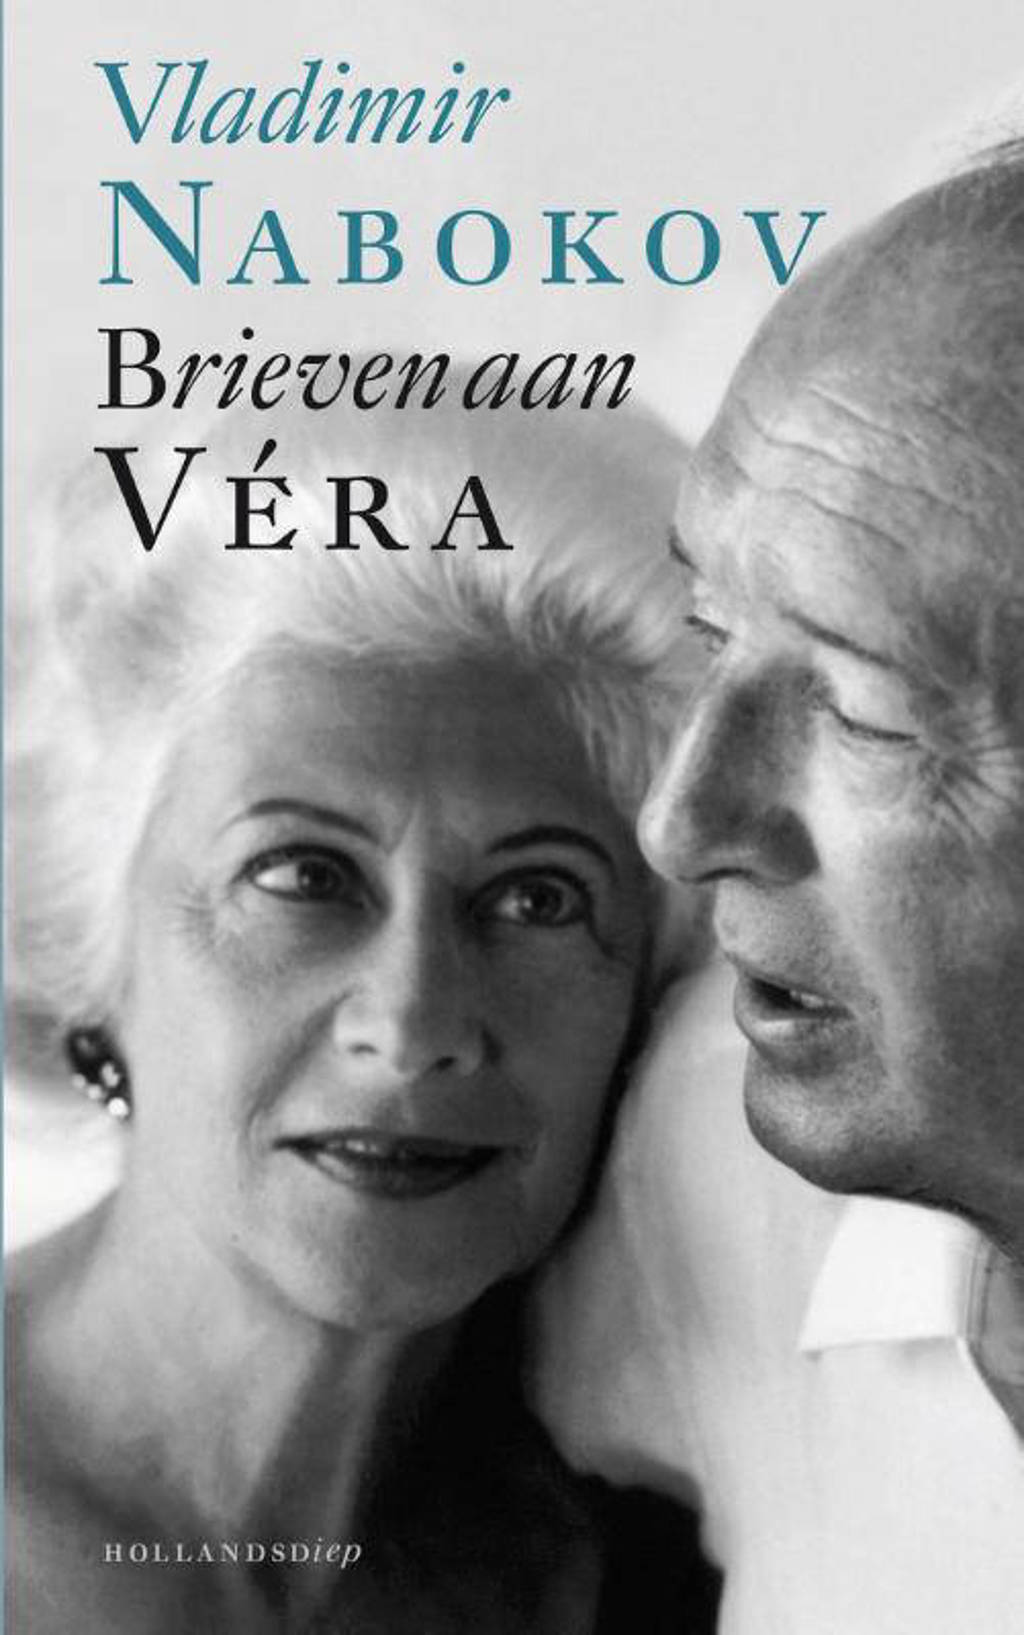 Brieven aan Véra - Vladimir Nabokov